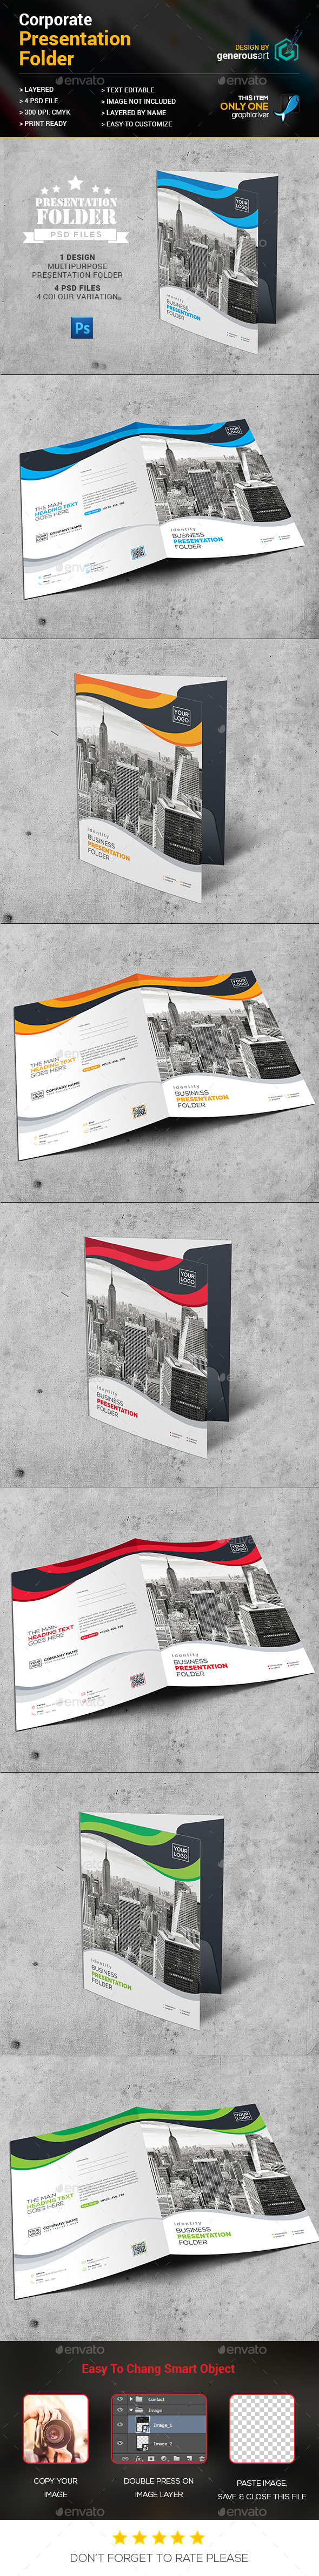 New Presentation Folder - Stationery Print Templates